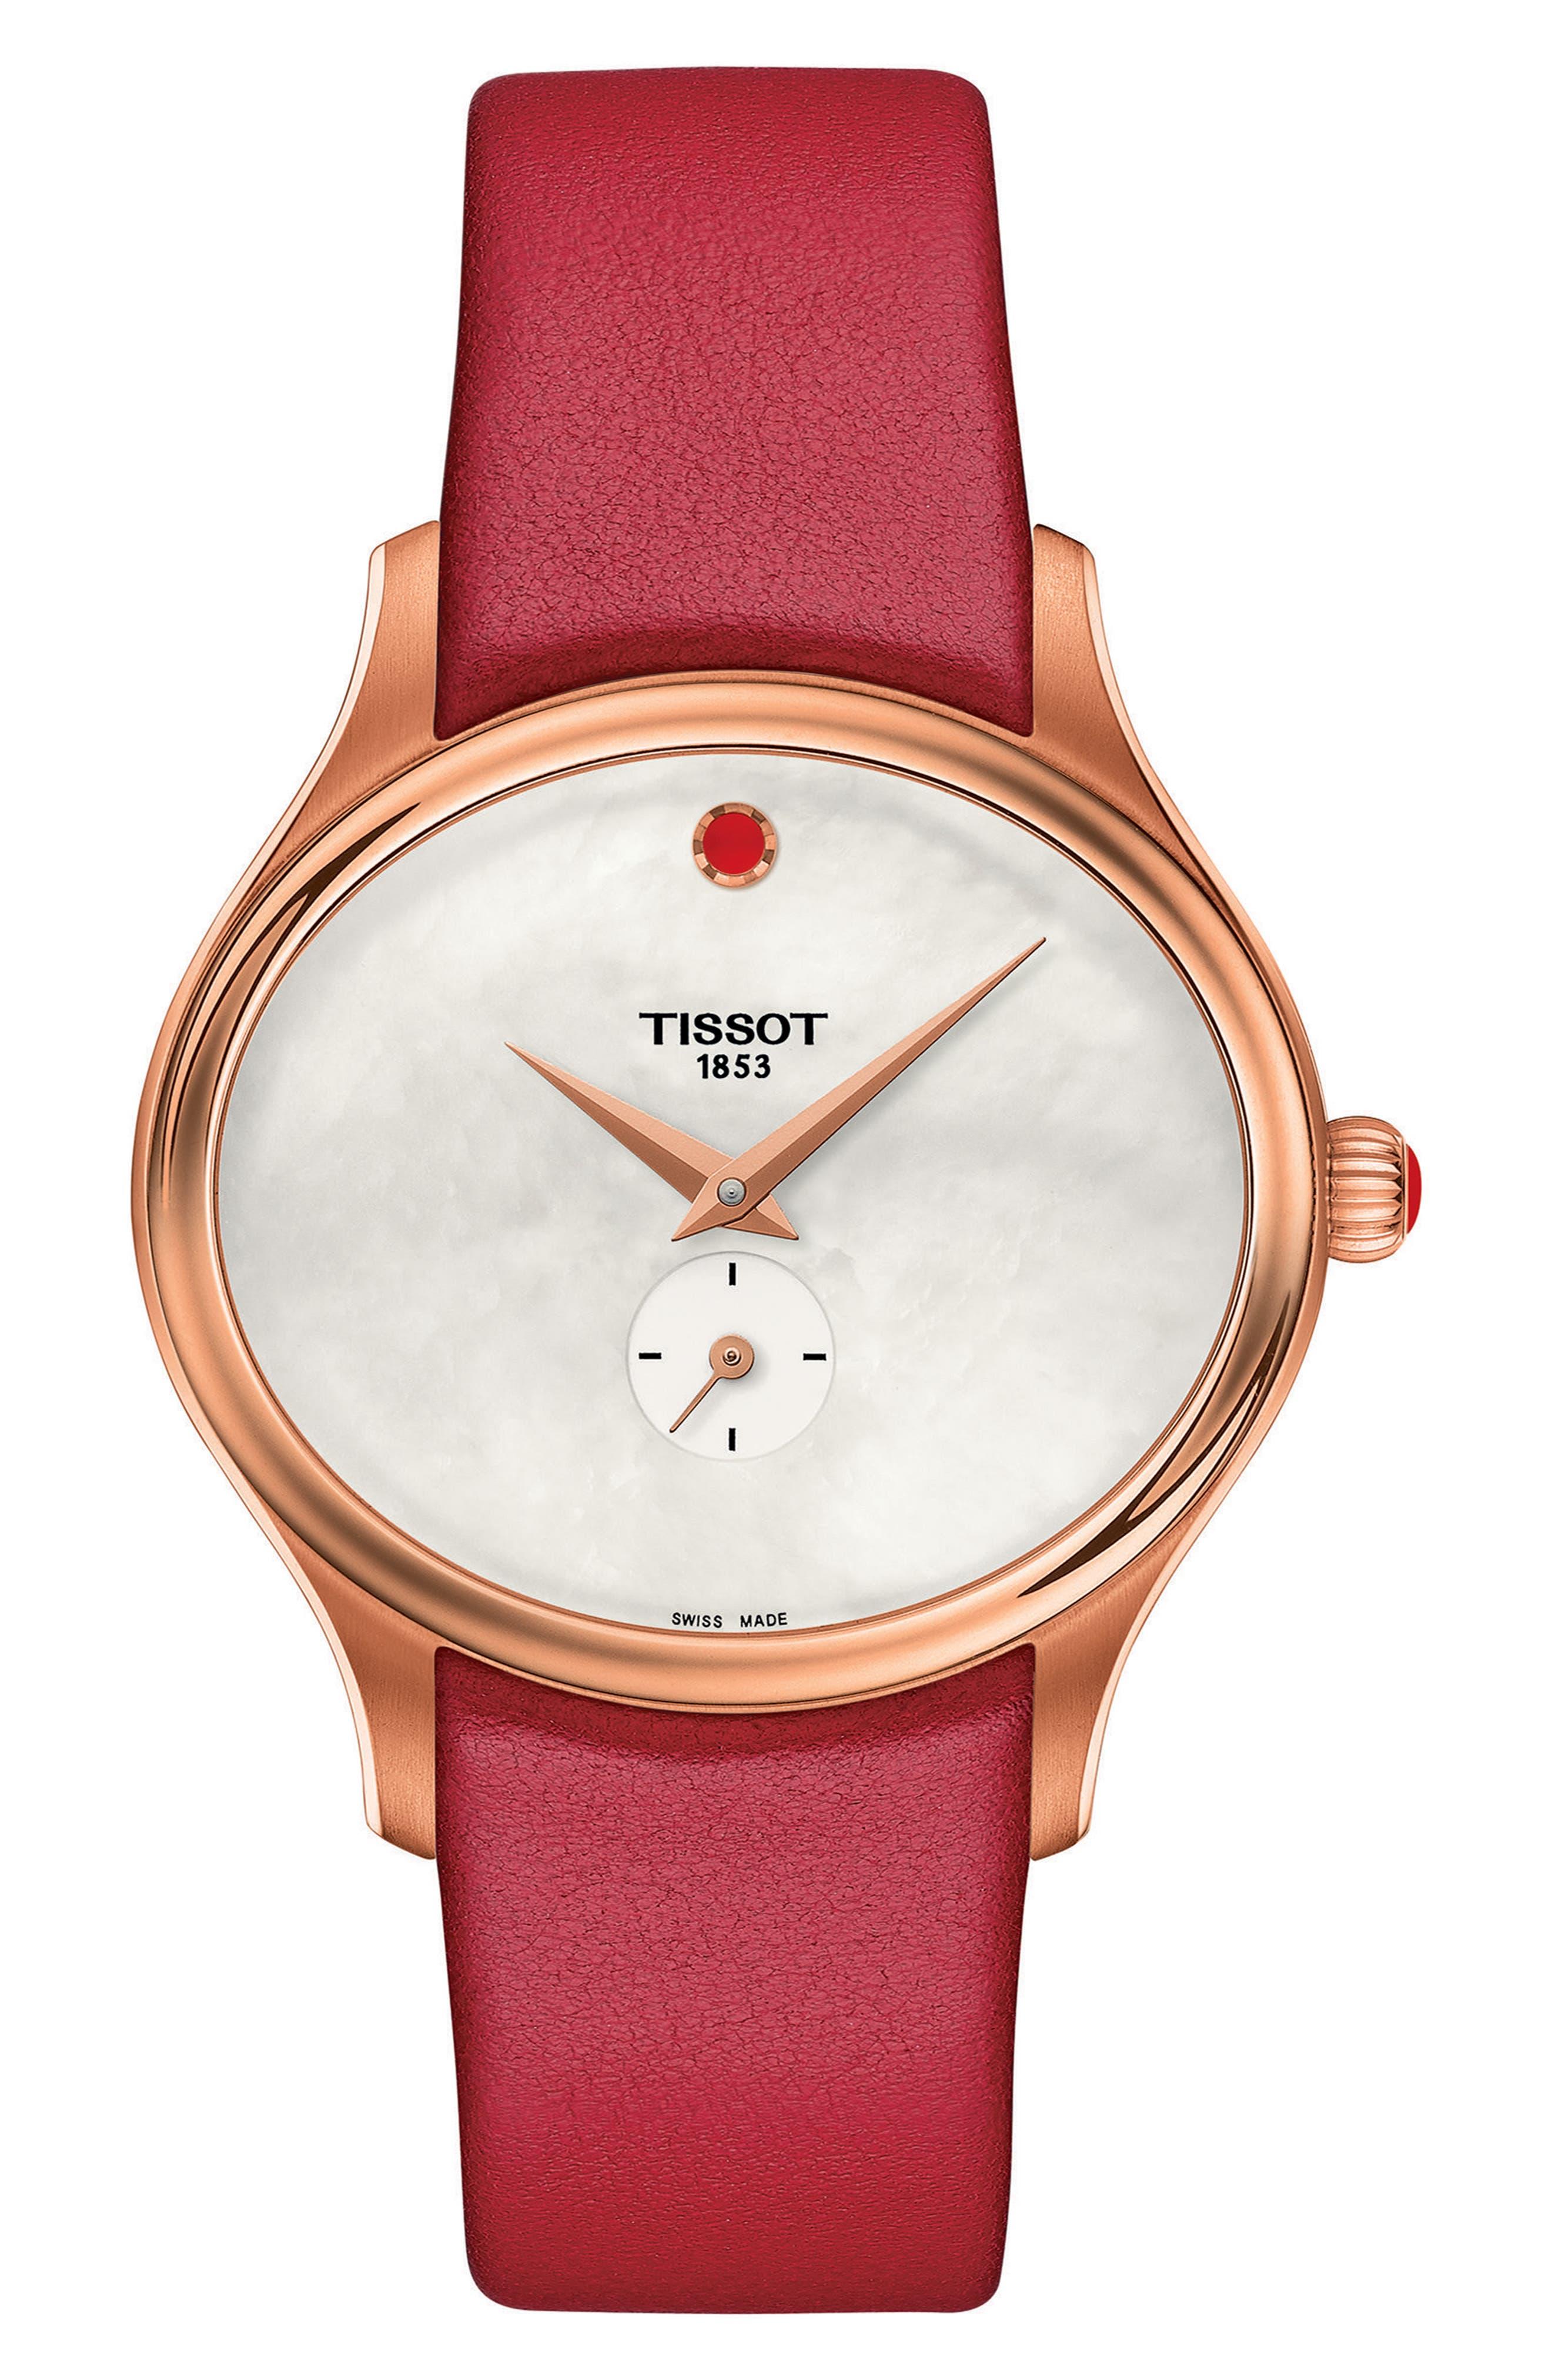 Main Image - Tissot Bella Ora Leather Strap Watch, 28mm x 31mm